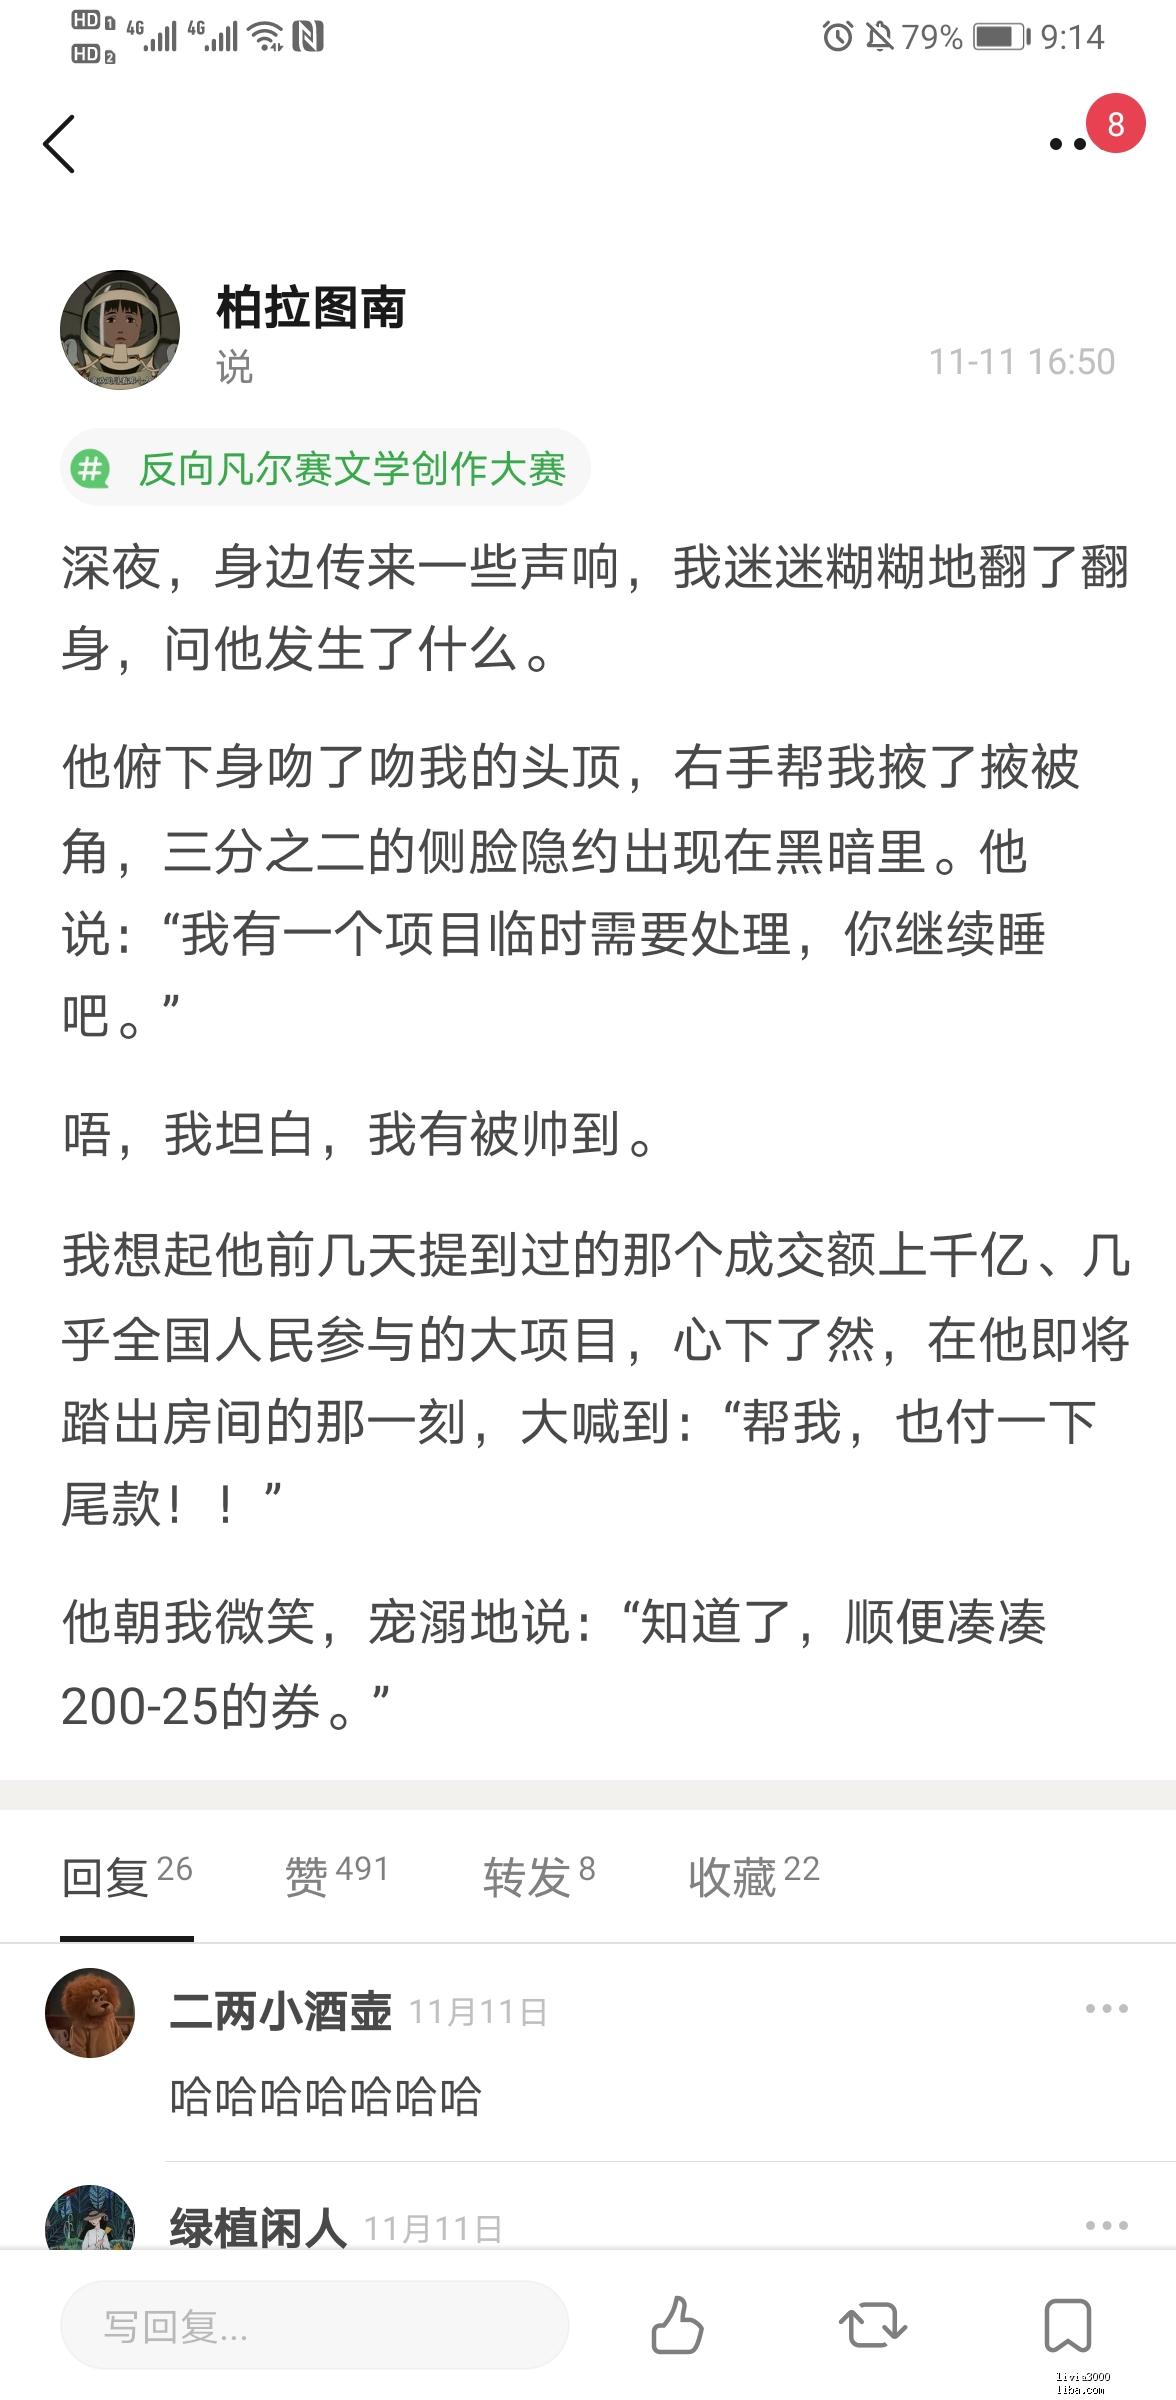 Screenshot_20201119_091406_com.douban.frodo.jpg